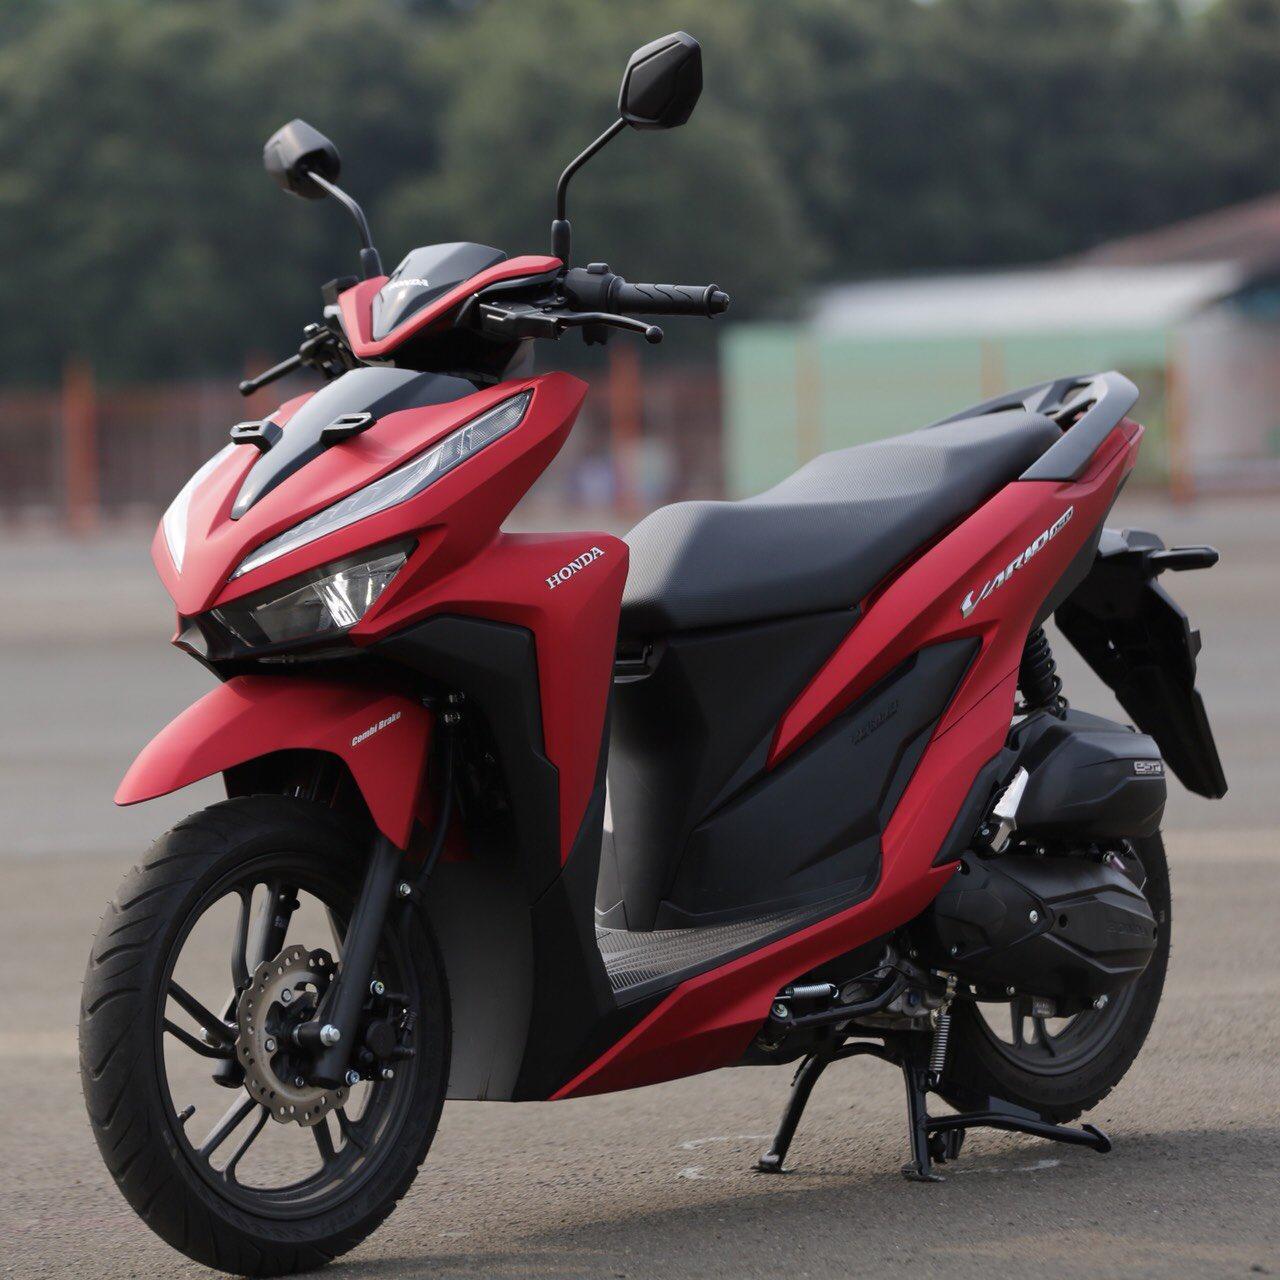 Spesifikasi Harga Model Baru All New Honda Vario 150 Dan All New